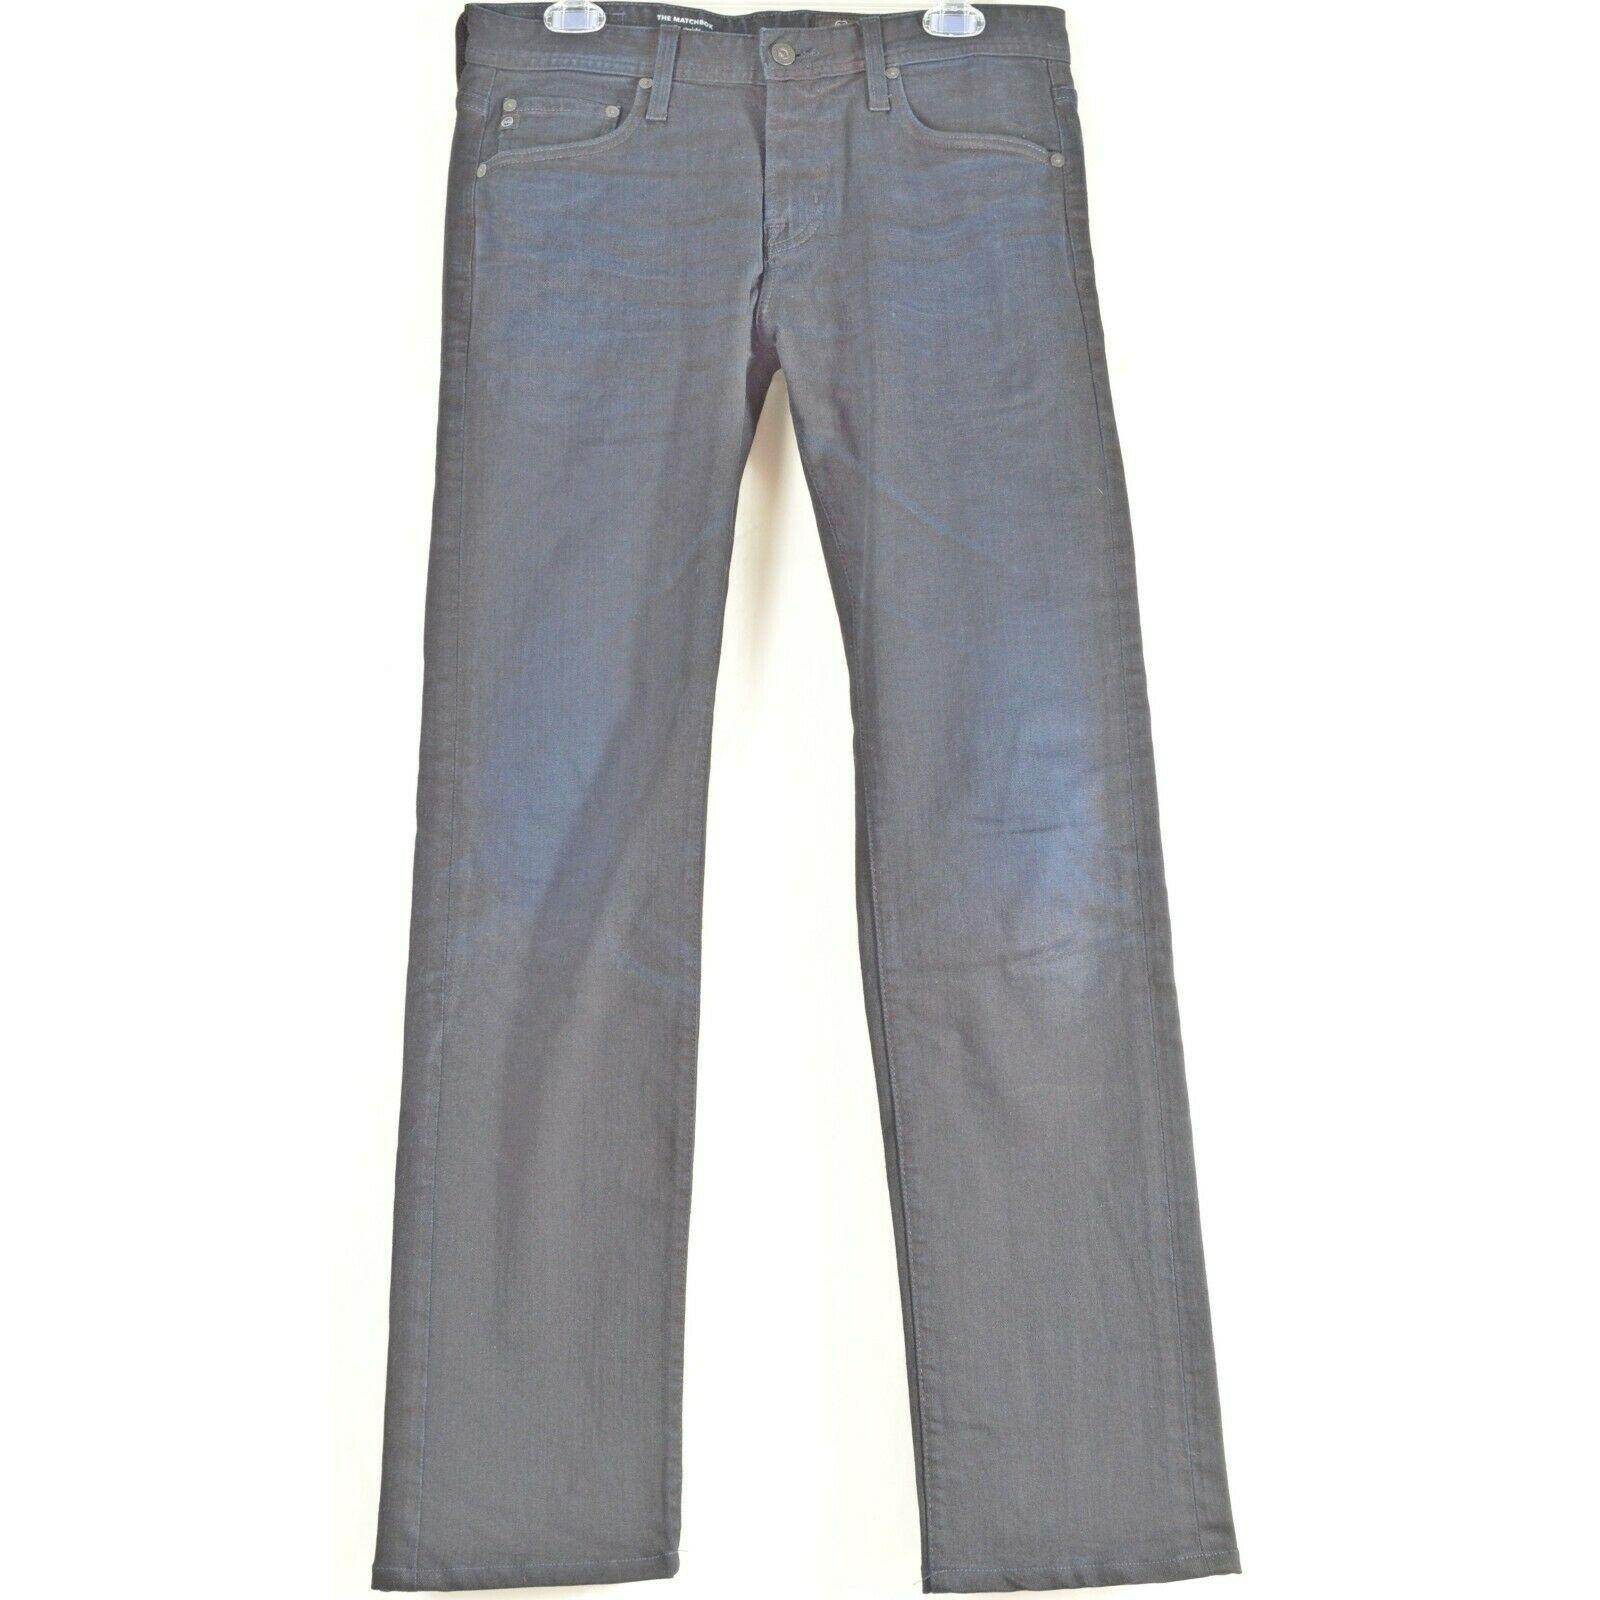 AG Adriano Goldschmied jeans 30 x 34 men Matchbox dark Slim Straight tall unique